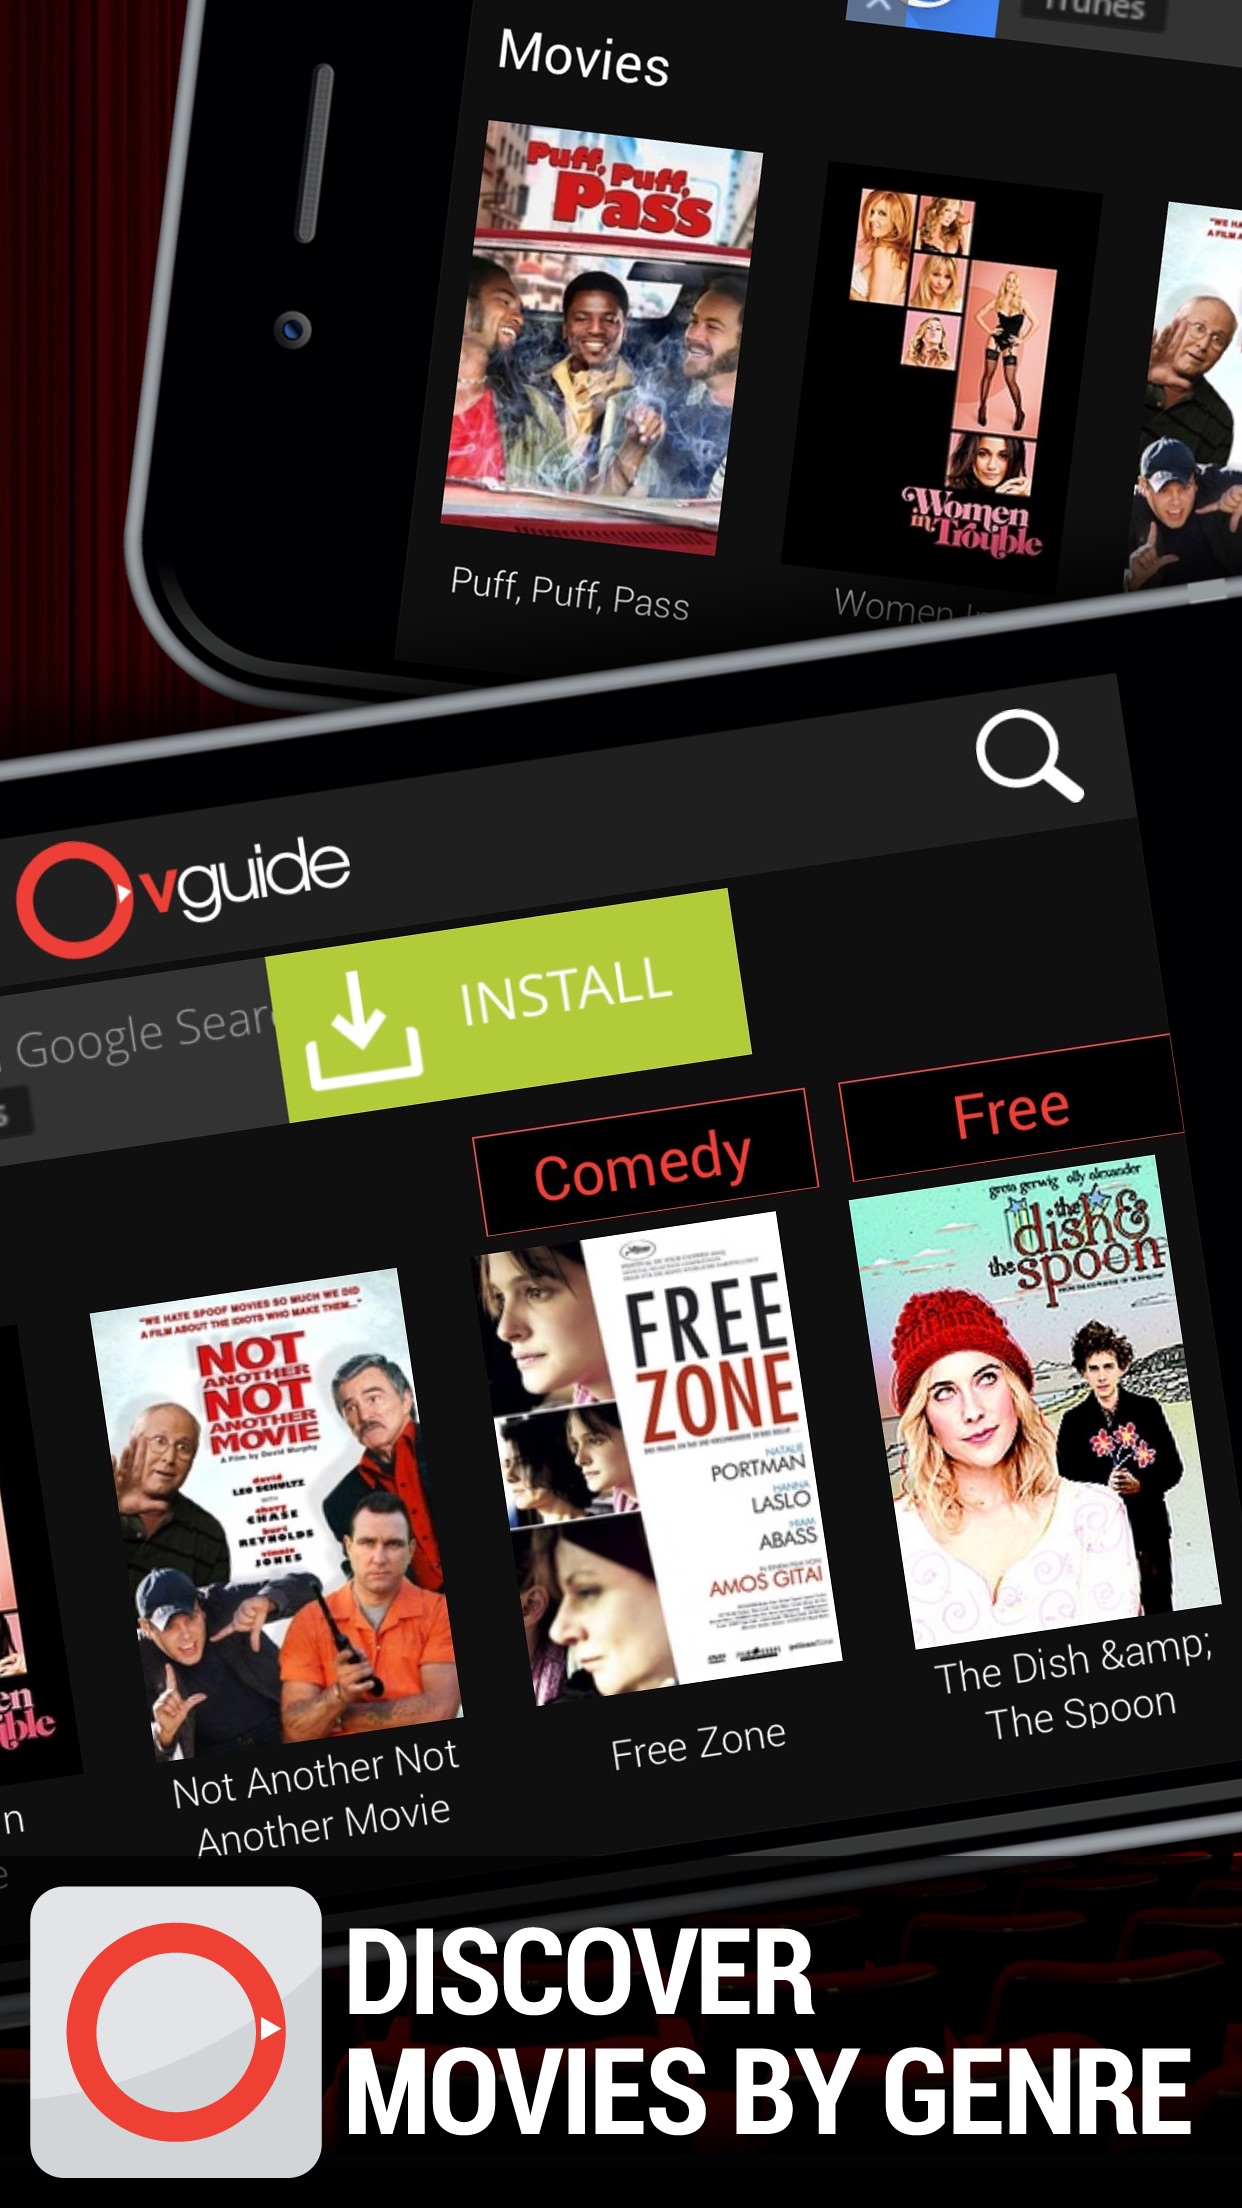 Watch Free Movies & TV - OVGuide Screenshot